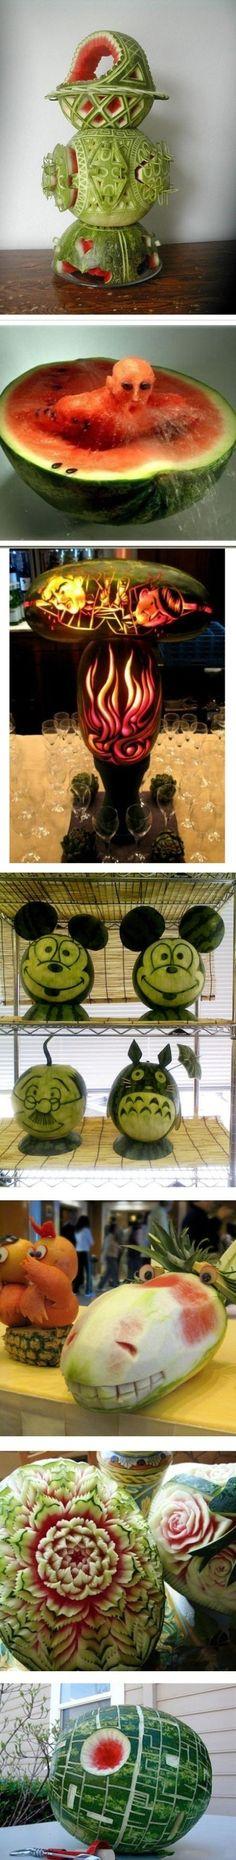 8 creative watermelon artworks 6-28